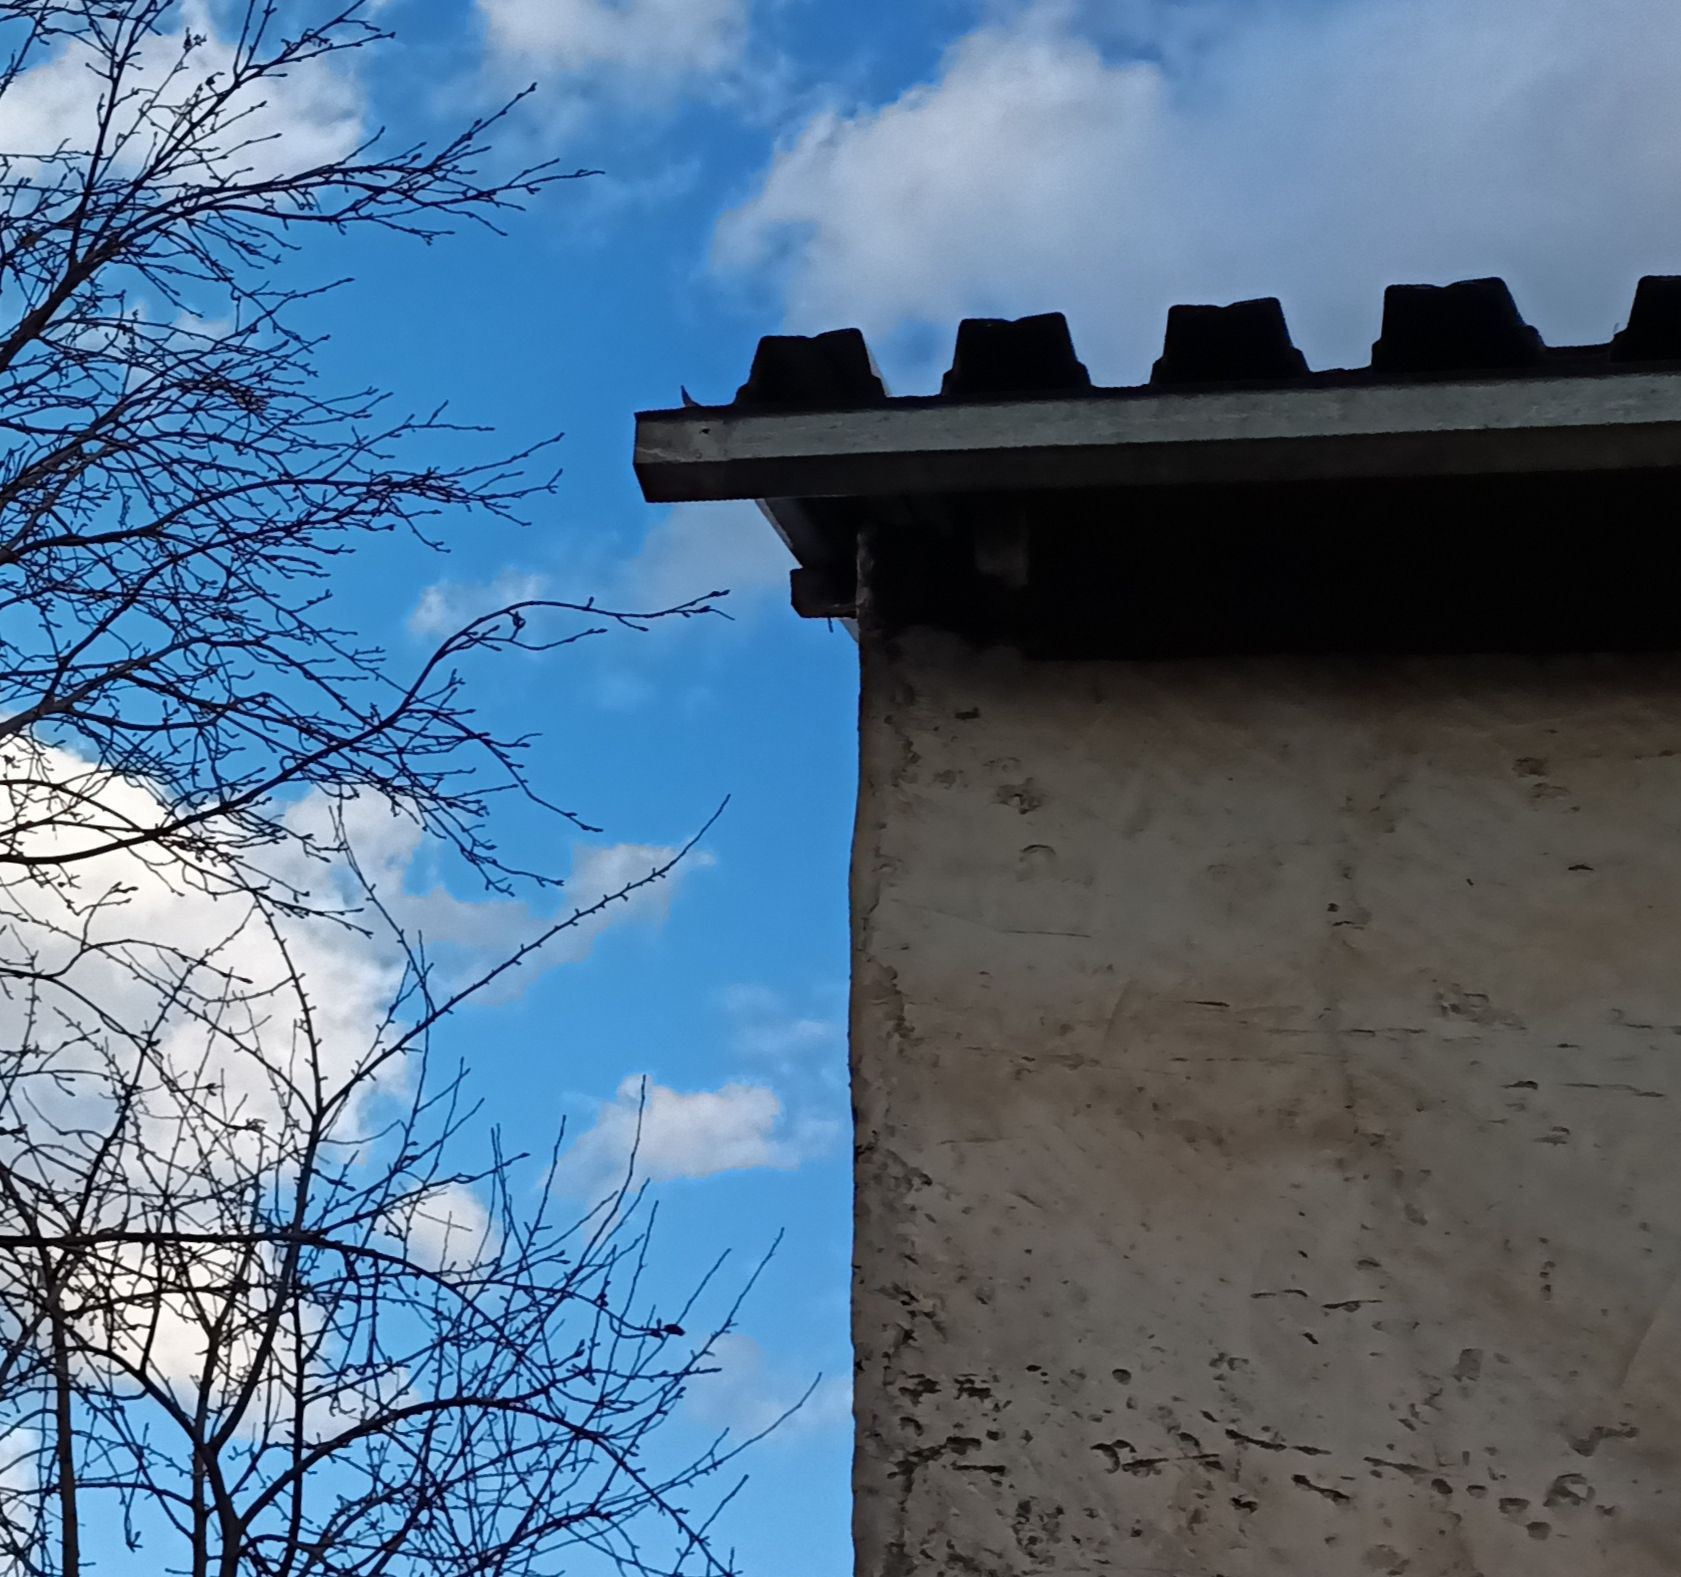 Замок Весна стена крыша дом замок голубое небо белые облака ветви